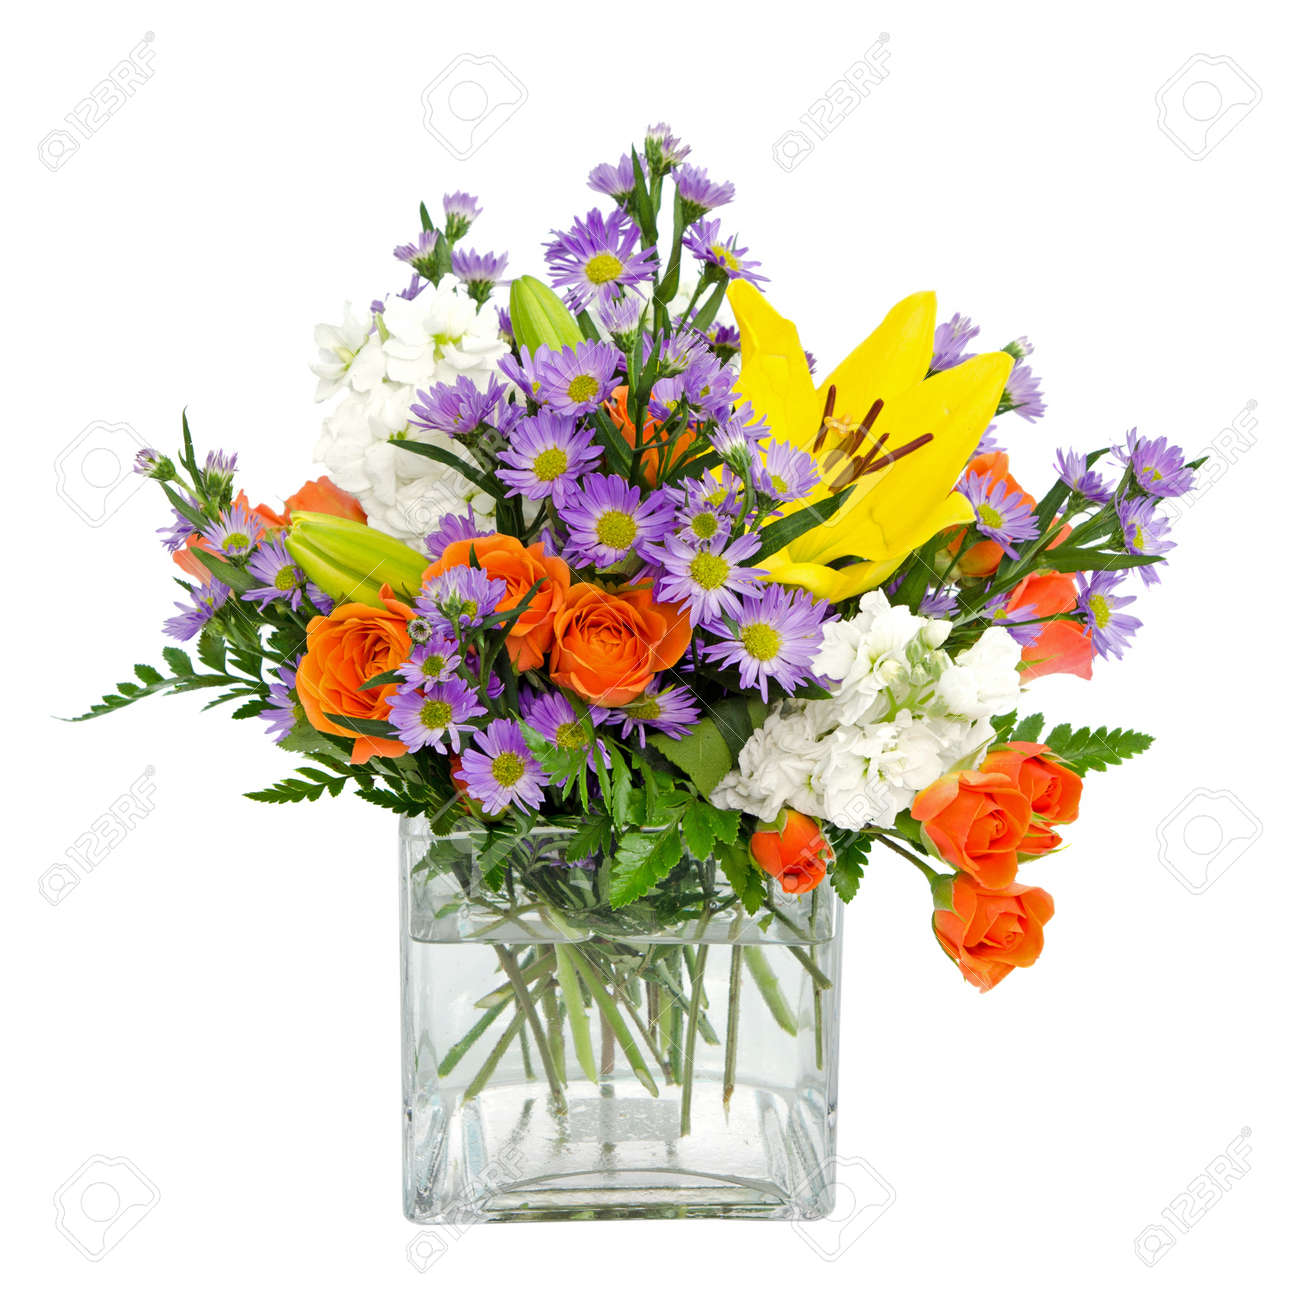 Berühmt Bunte Blumen-Arrangement Herzstück In Eckigen Glas-Vase Mit Rosen &OE_16